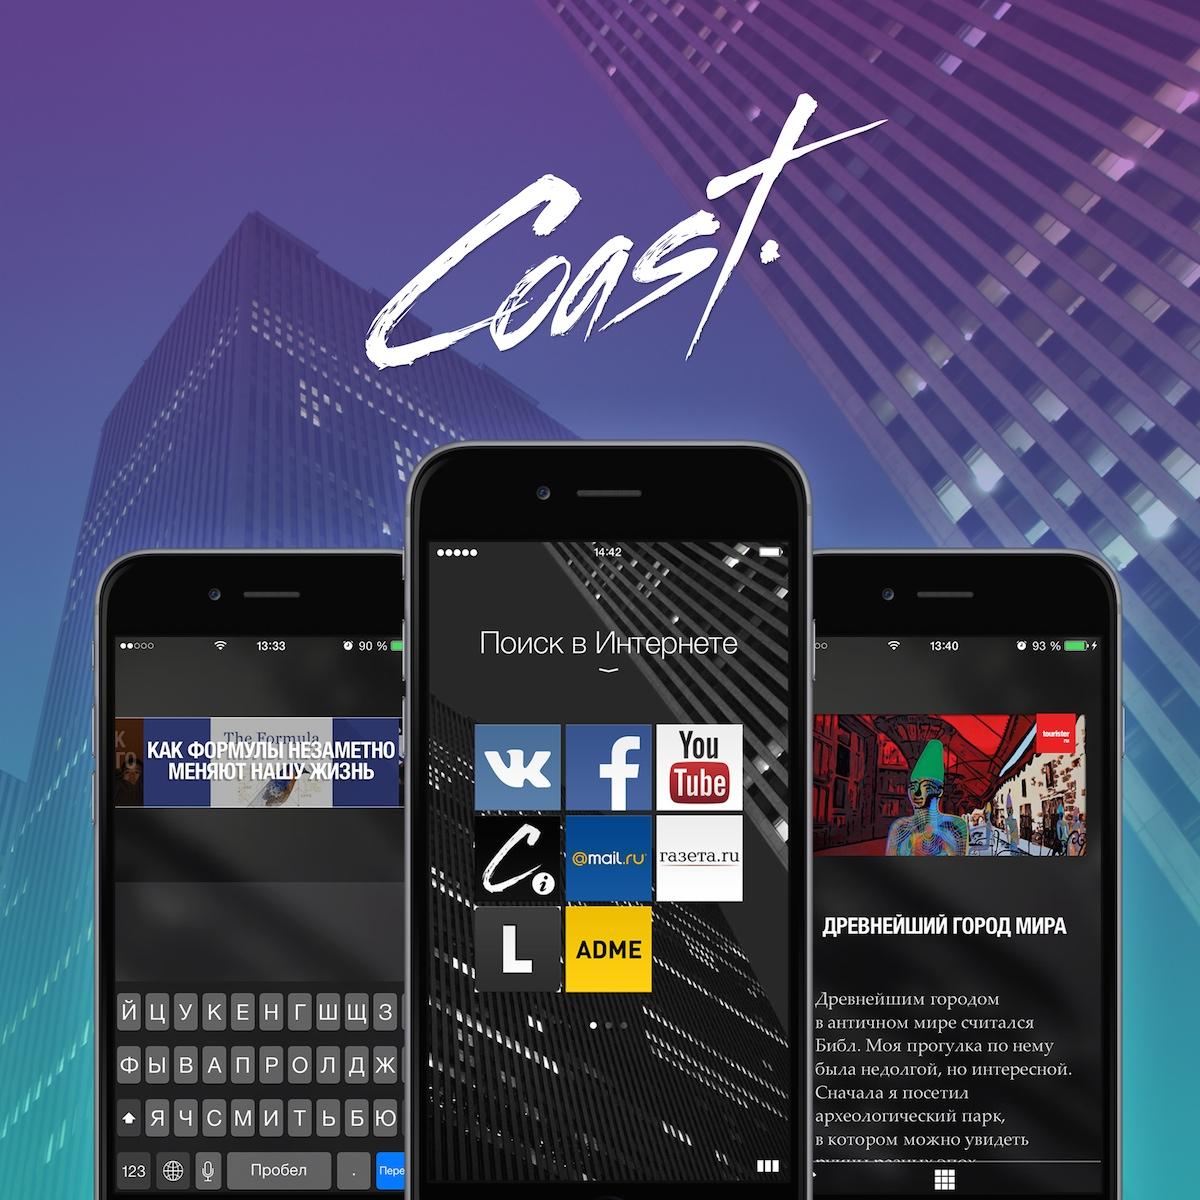 Браузер Opera Coast 4.0 для iPhone и iPad